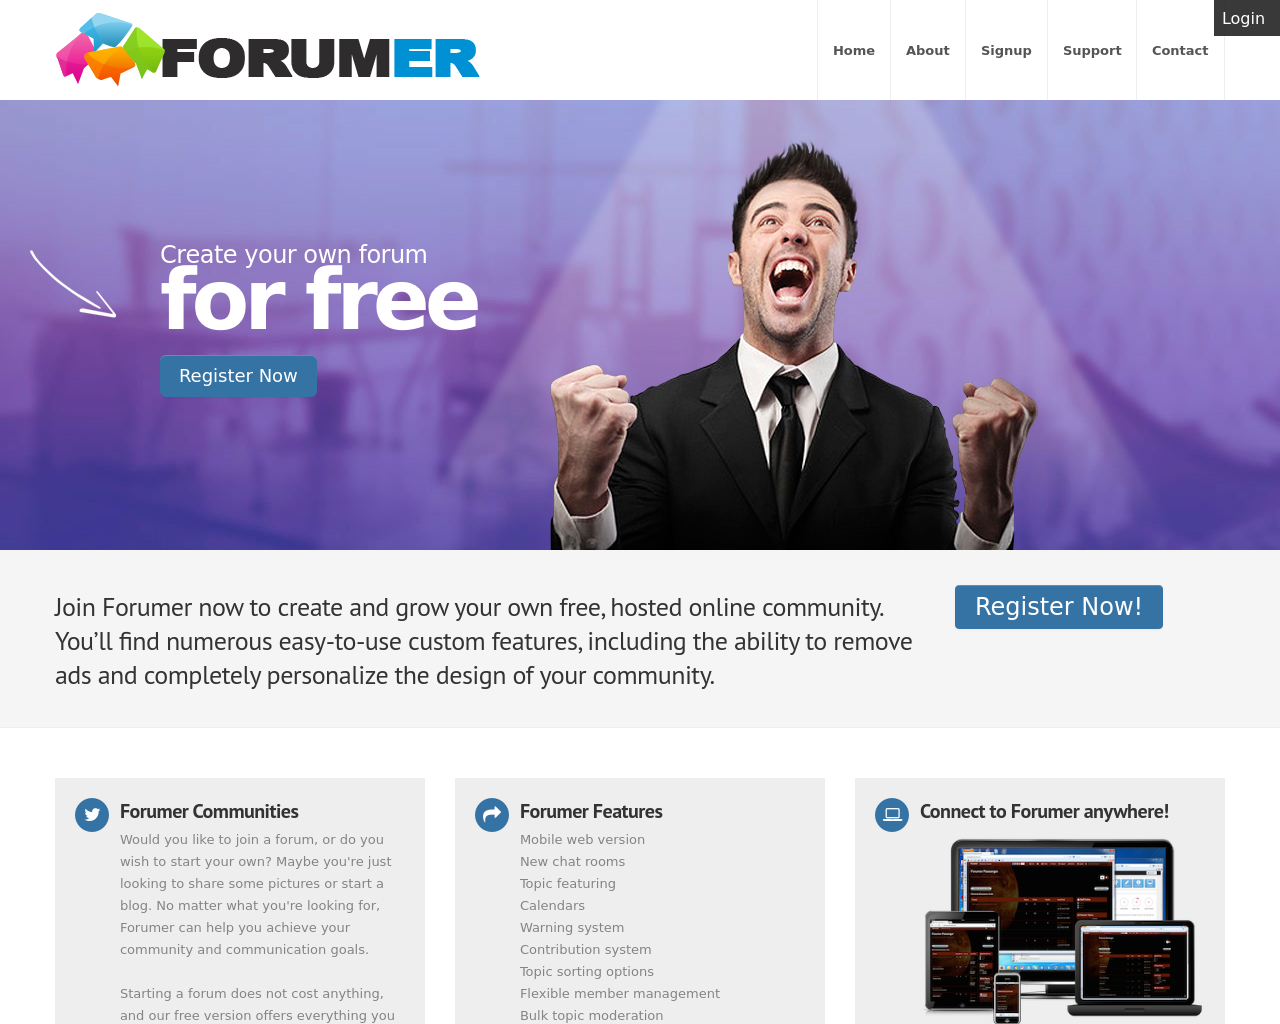 Forumer-Advertising-Reviews-Pricing